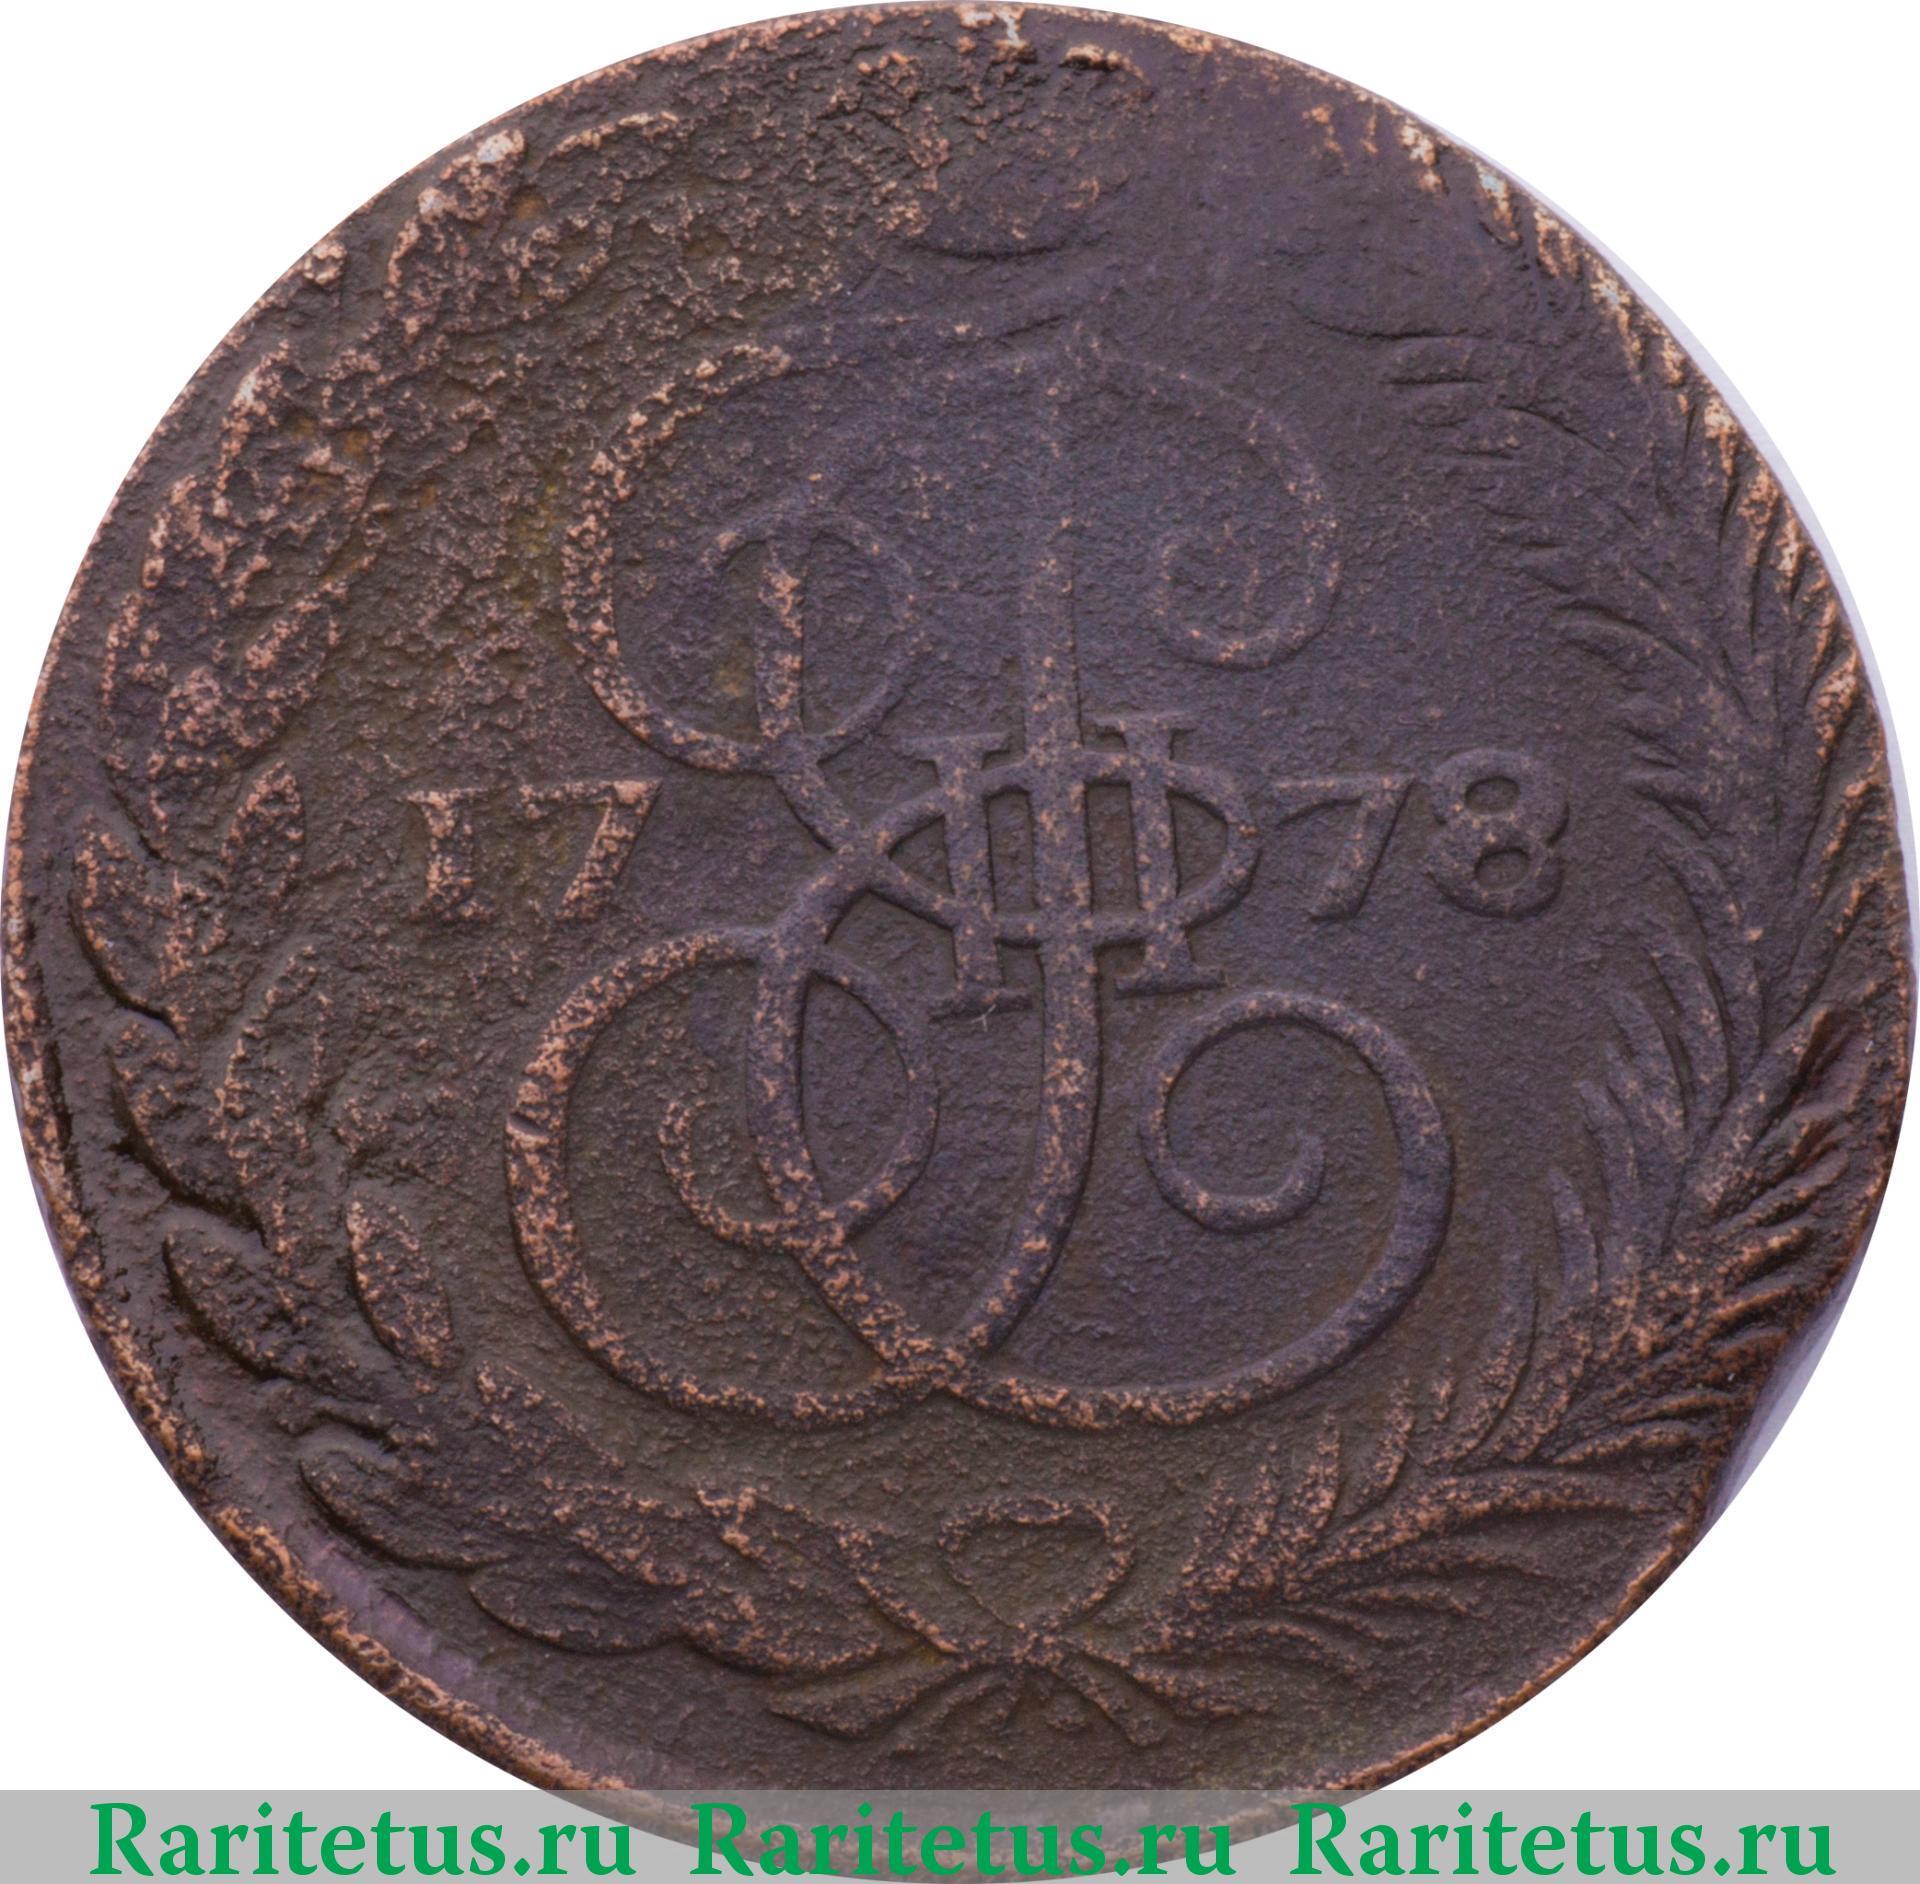 Пять копеек екатерины монета 1 фунт стерлингов цена